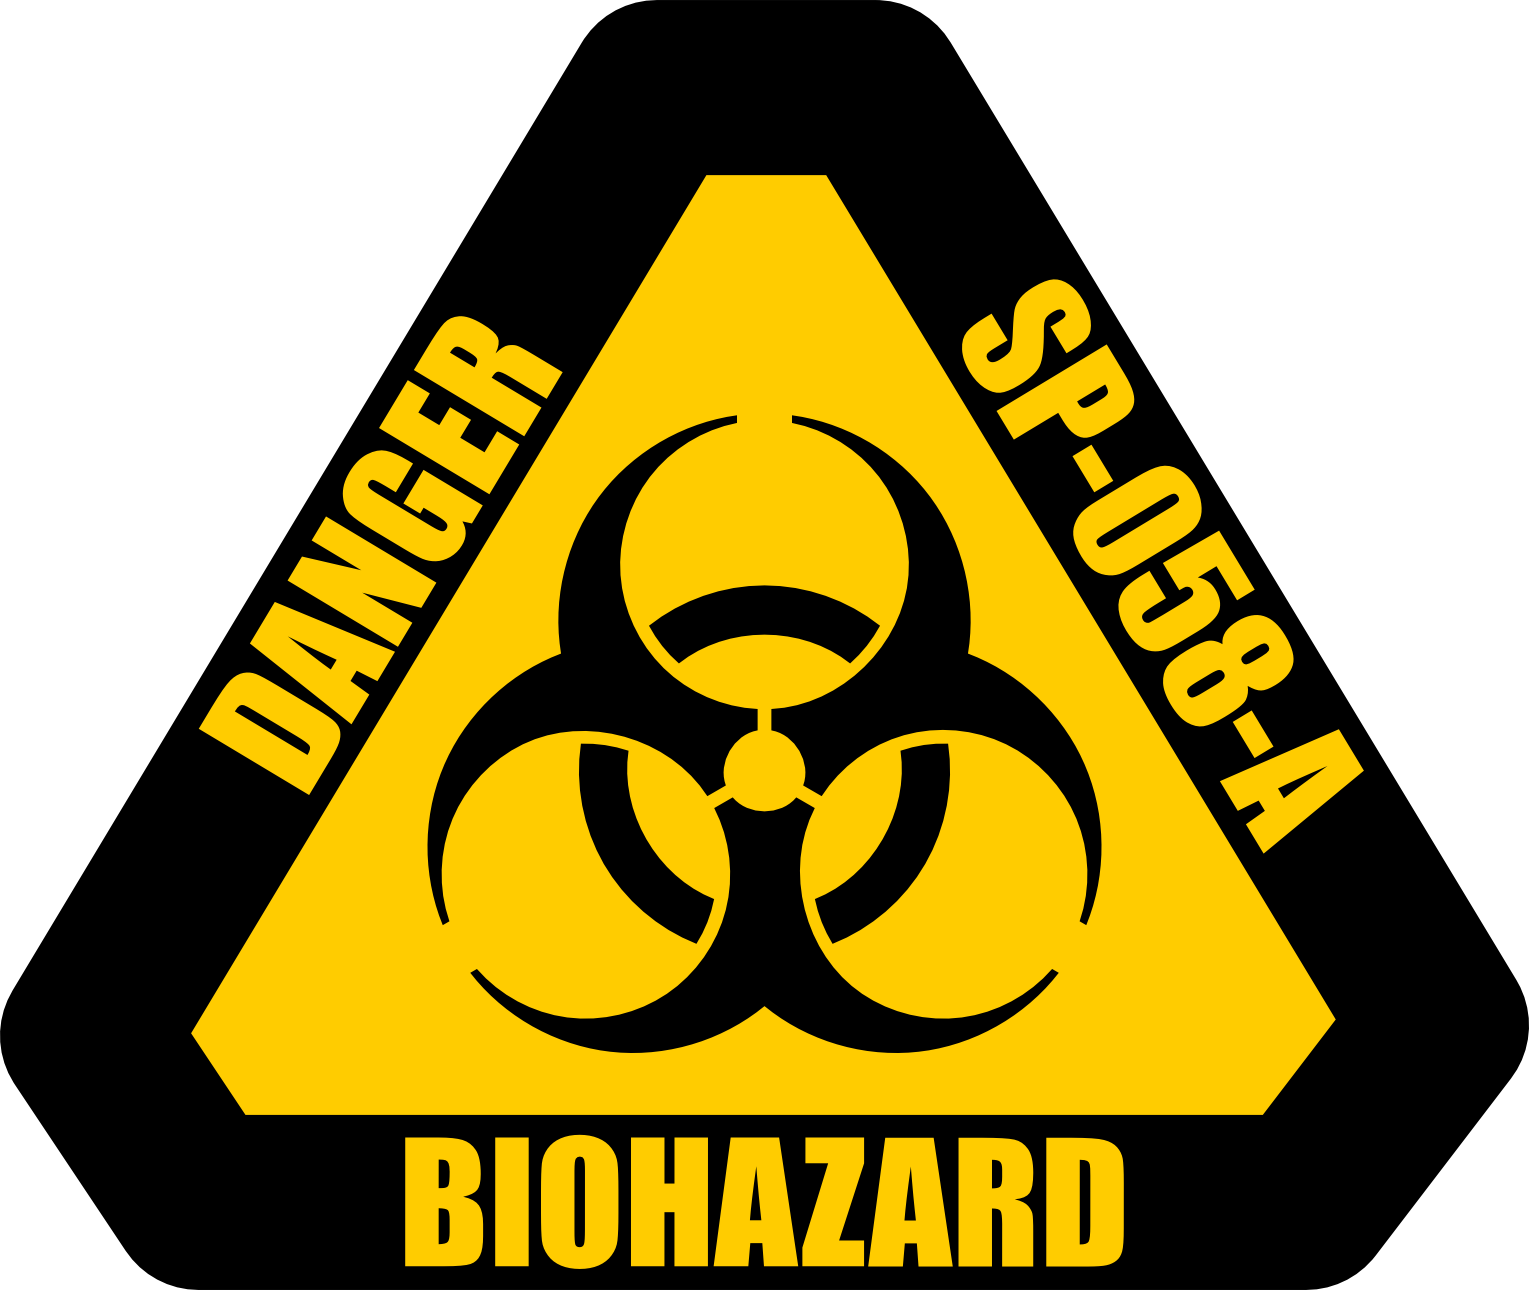 biohazard sign - photo #22